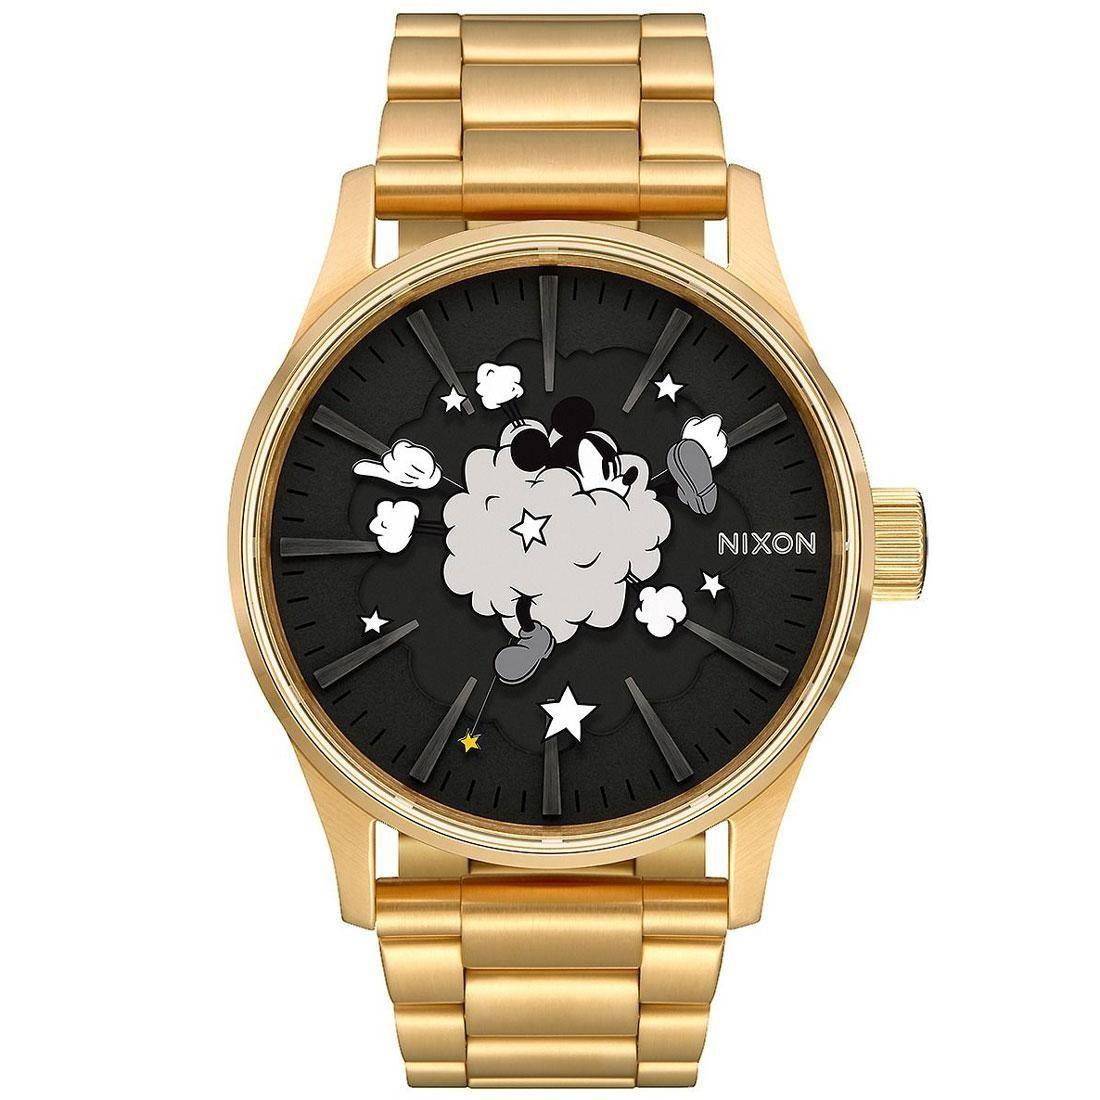 Nixon x Disney Sentry SS Gold Watch - Mickey Fight (gold / black / cloud)